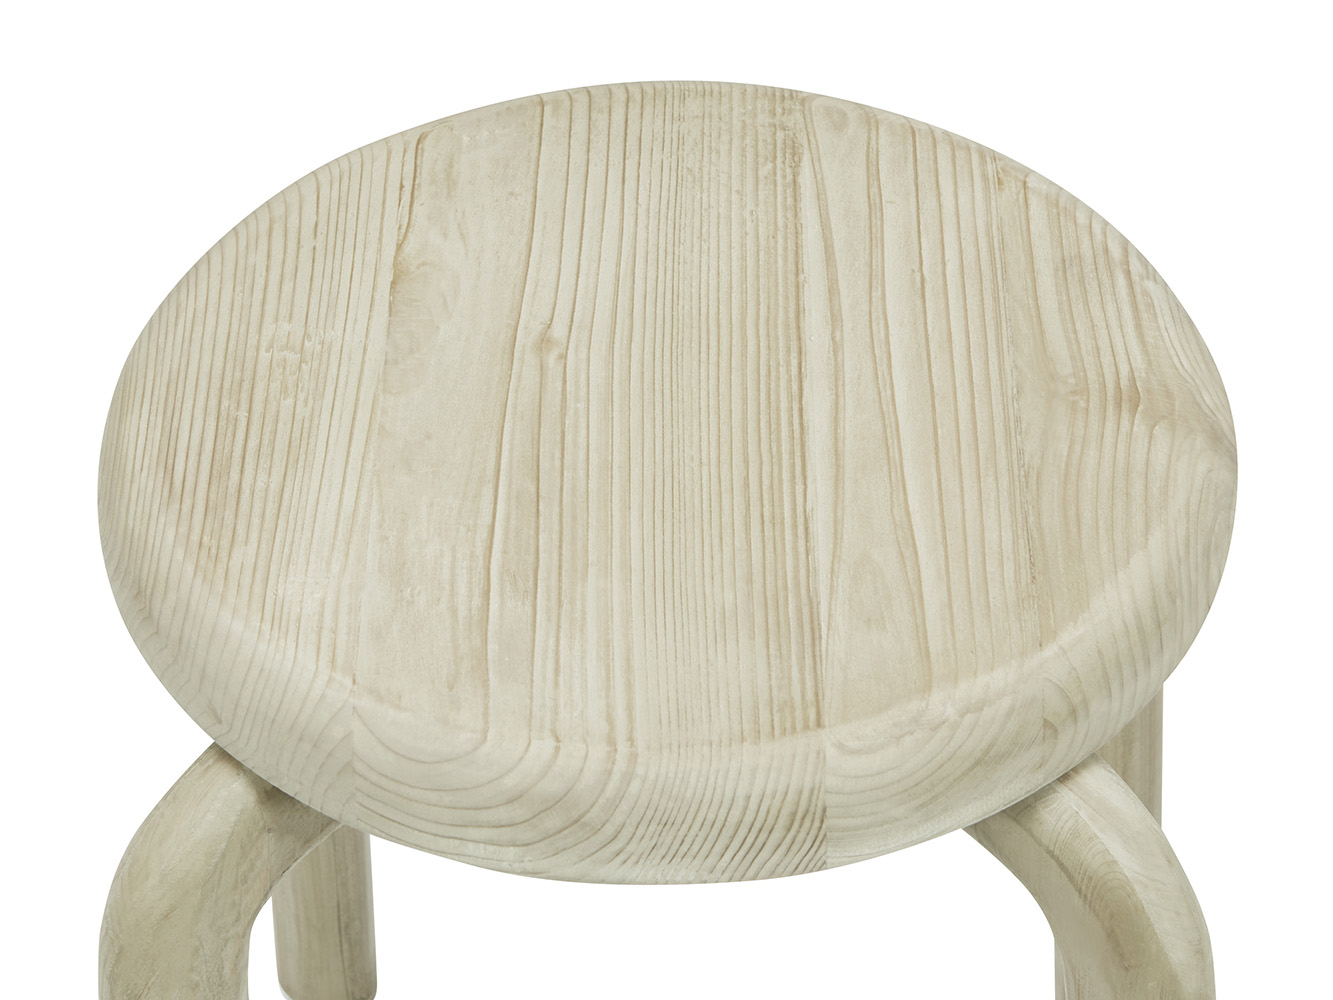 Super Pair Of Stacker Stools Machost Co Dining Chair Design Ideas Machostcouk